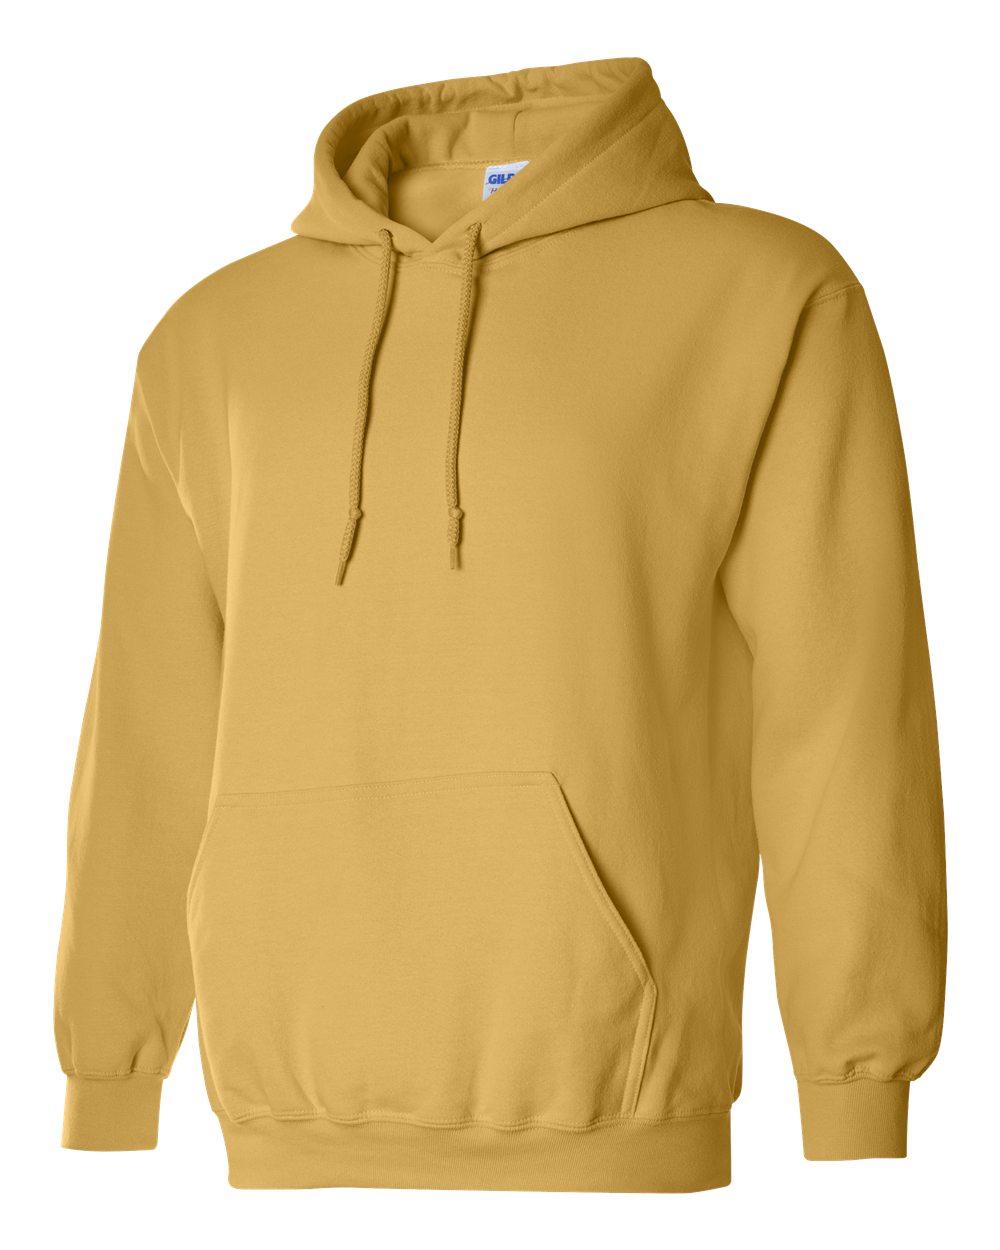 Gildan Heavy Blend Hooded Sweatshirt GI18500 Honey